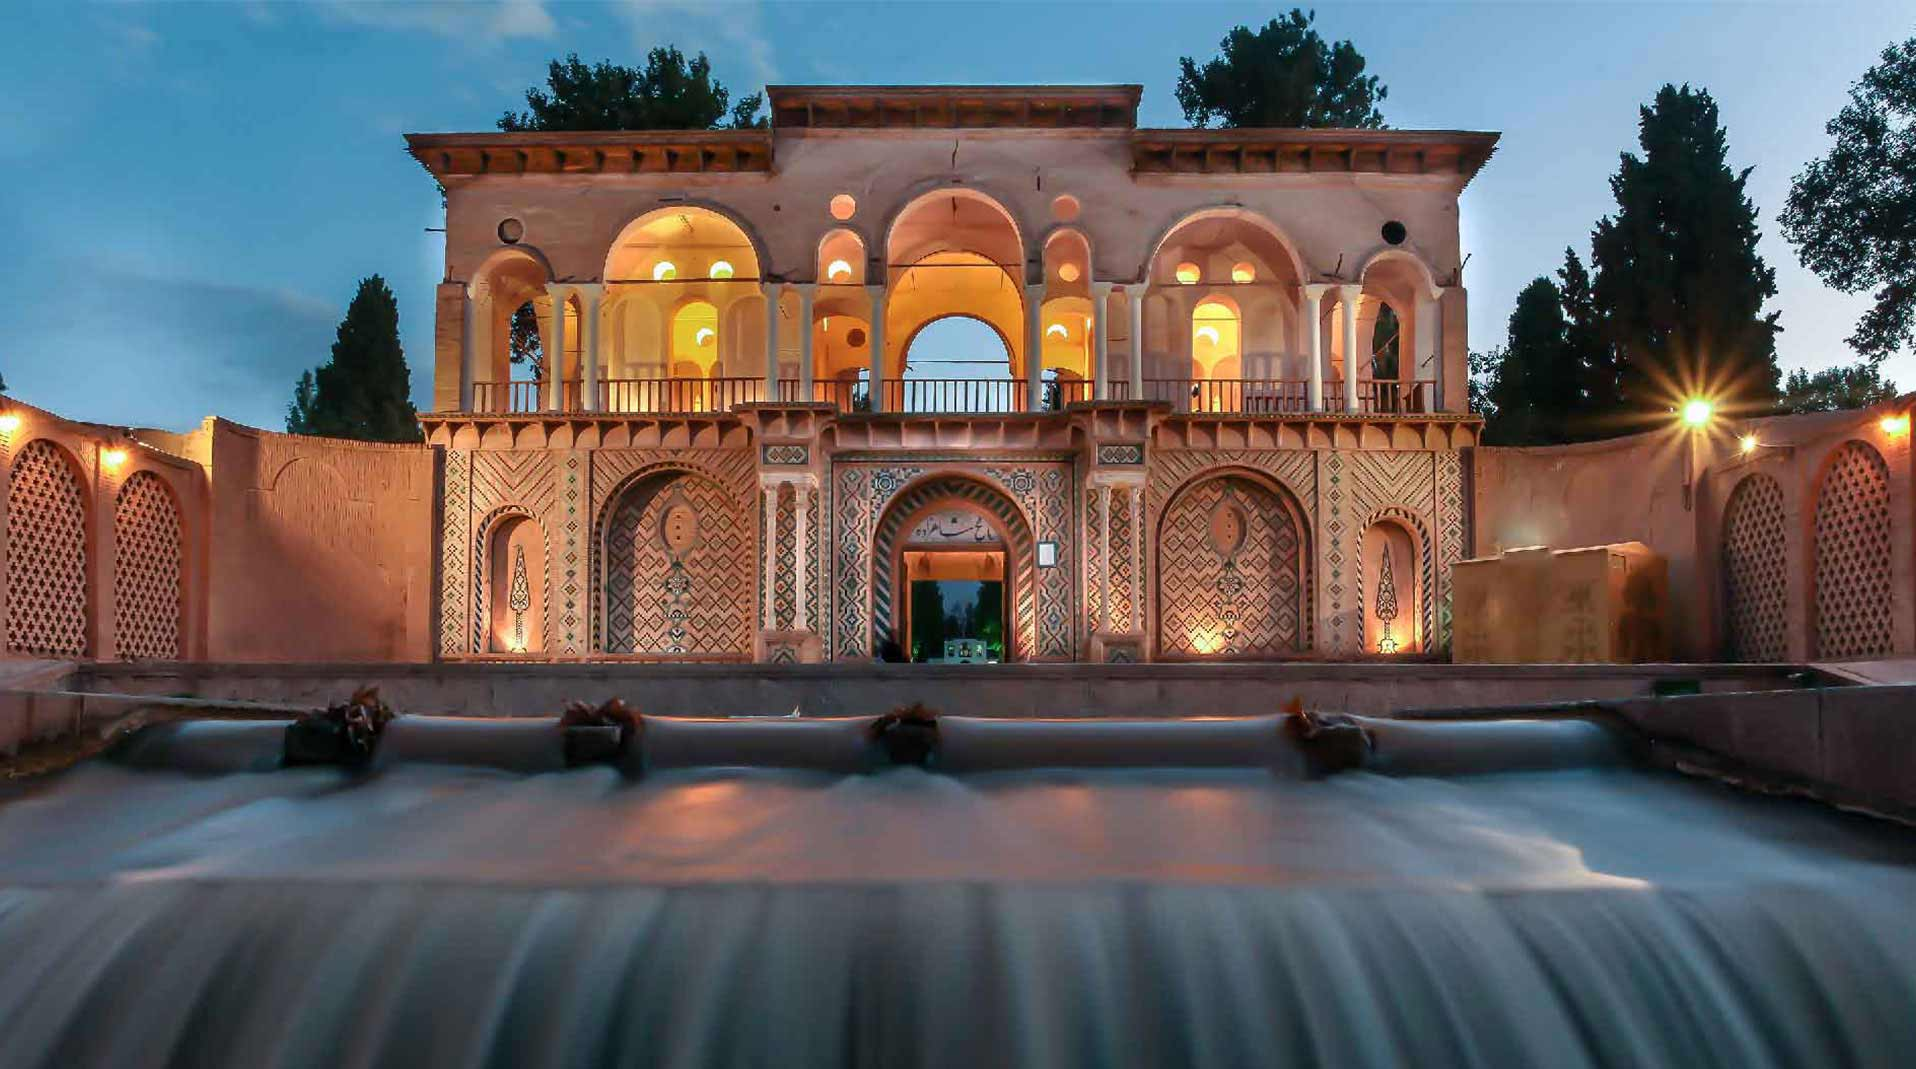 Day 5, Dec. 28th: Shiraz- Kerman